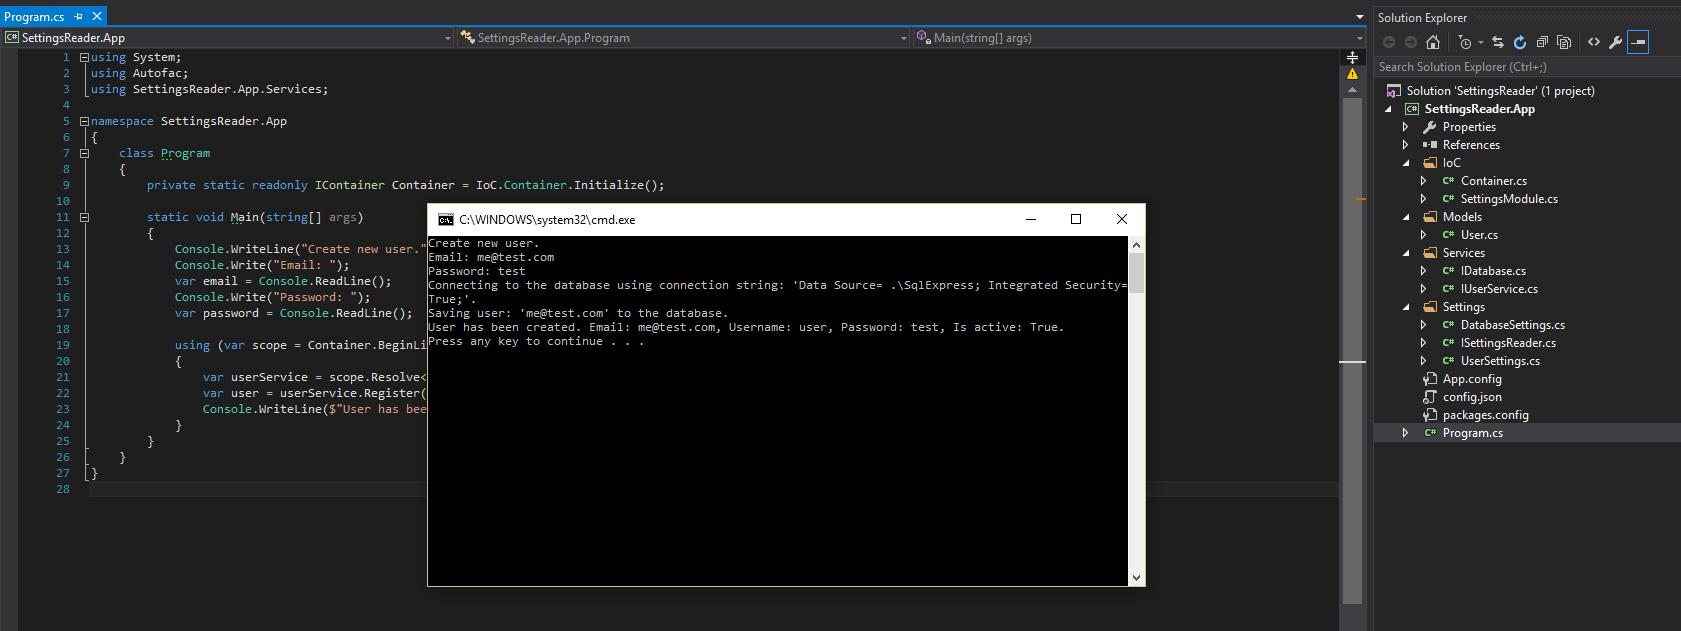 Storing C# app settings with JSON | Piotr Gankiewicz